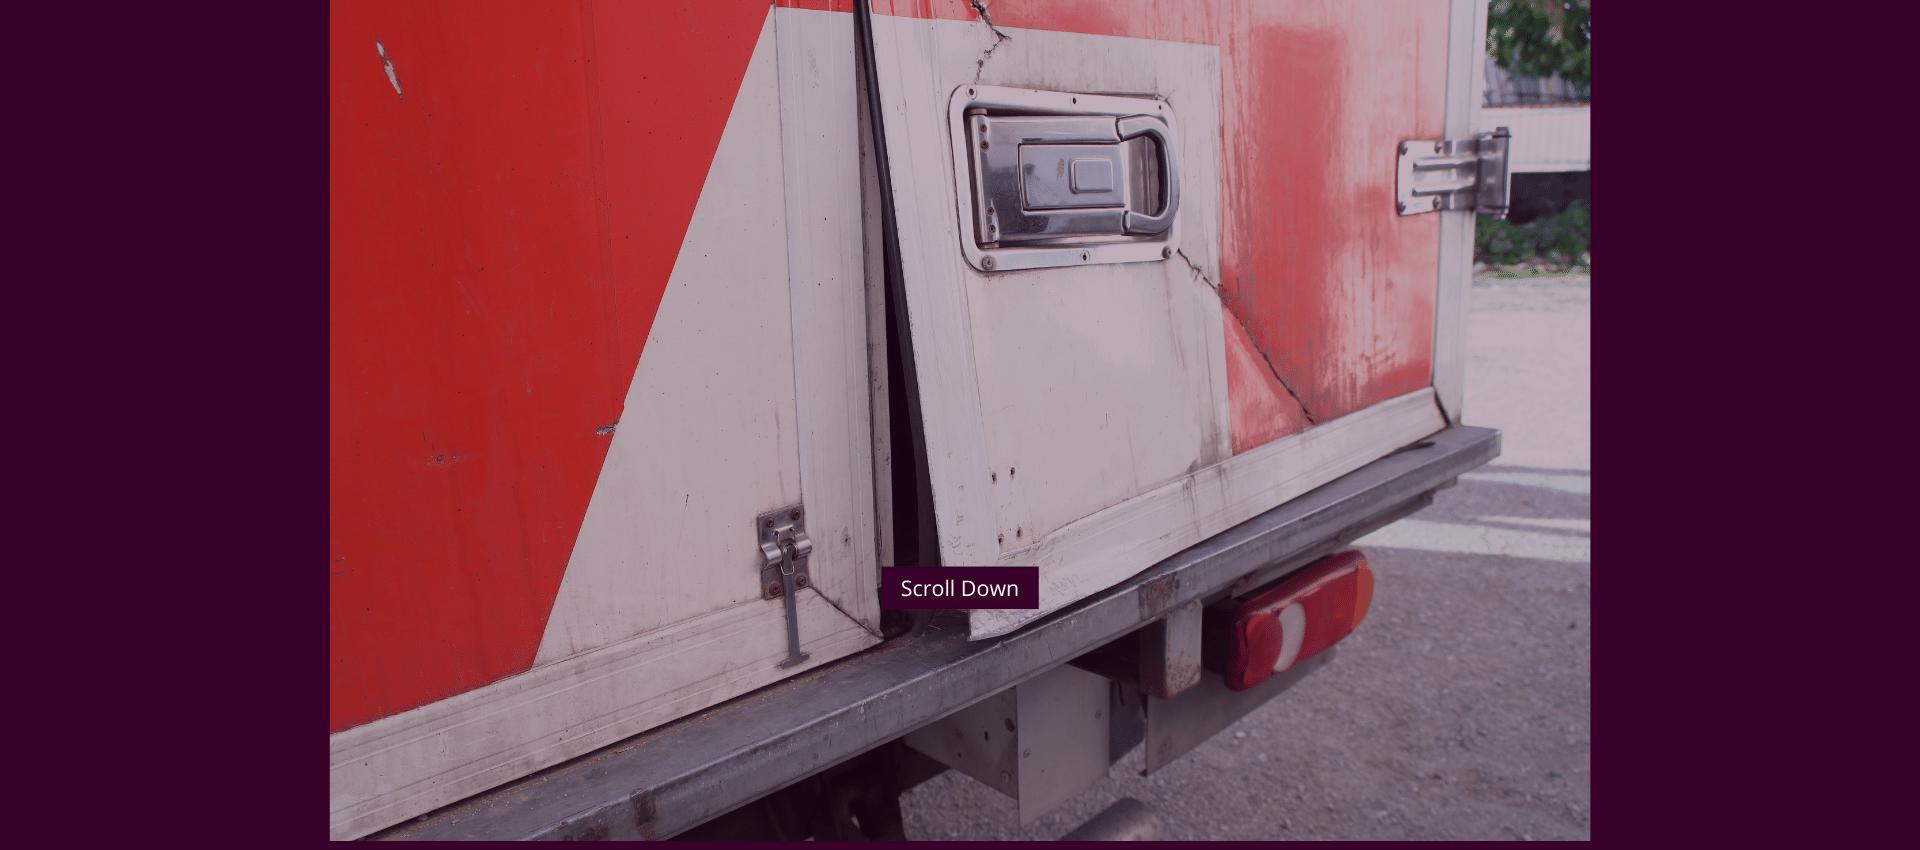 What is the best way to secure my van doors?